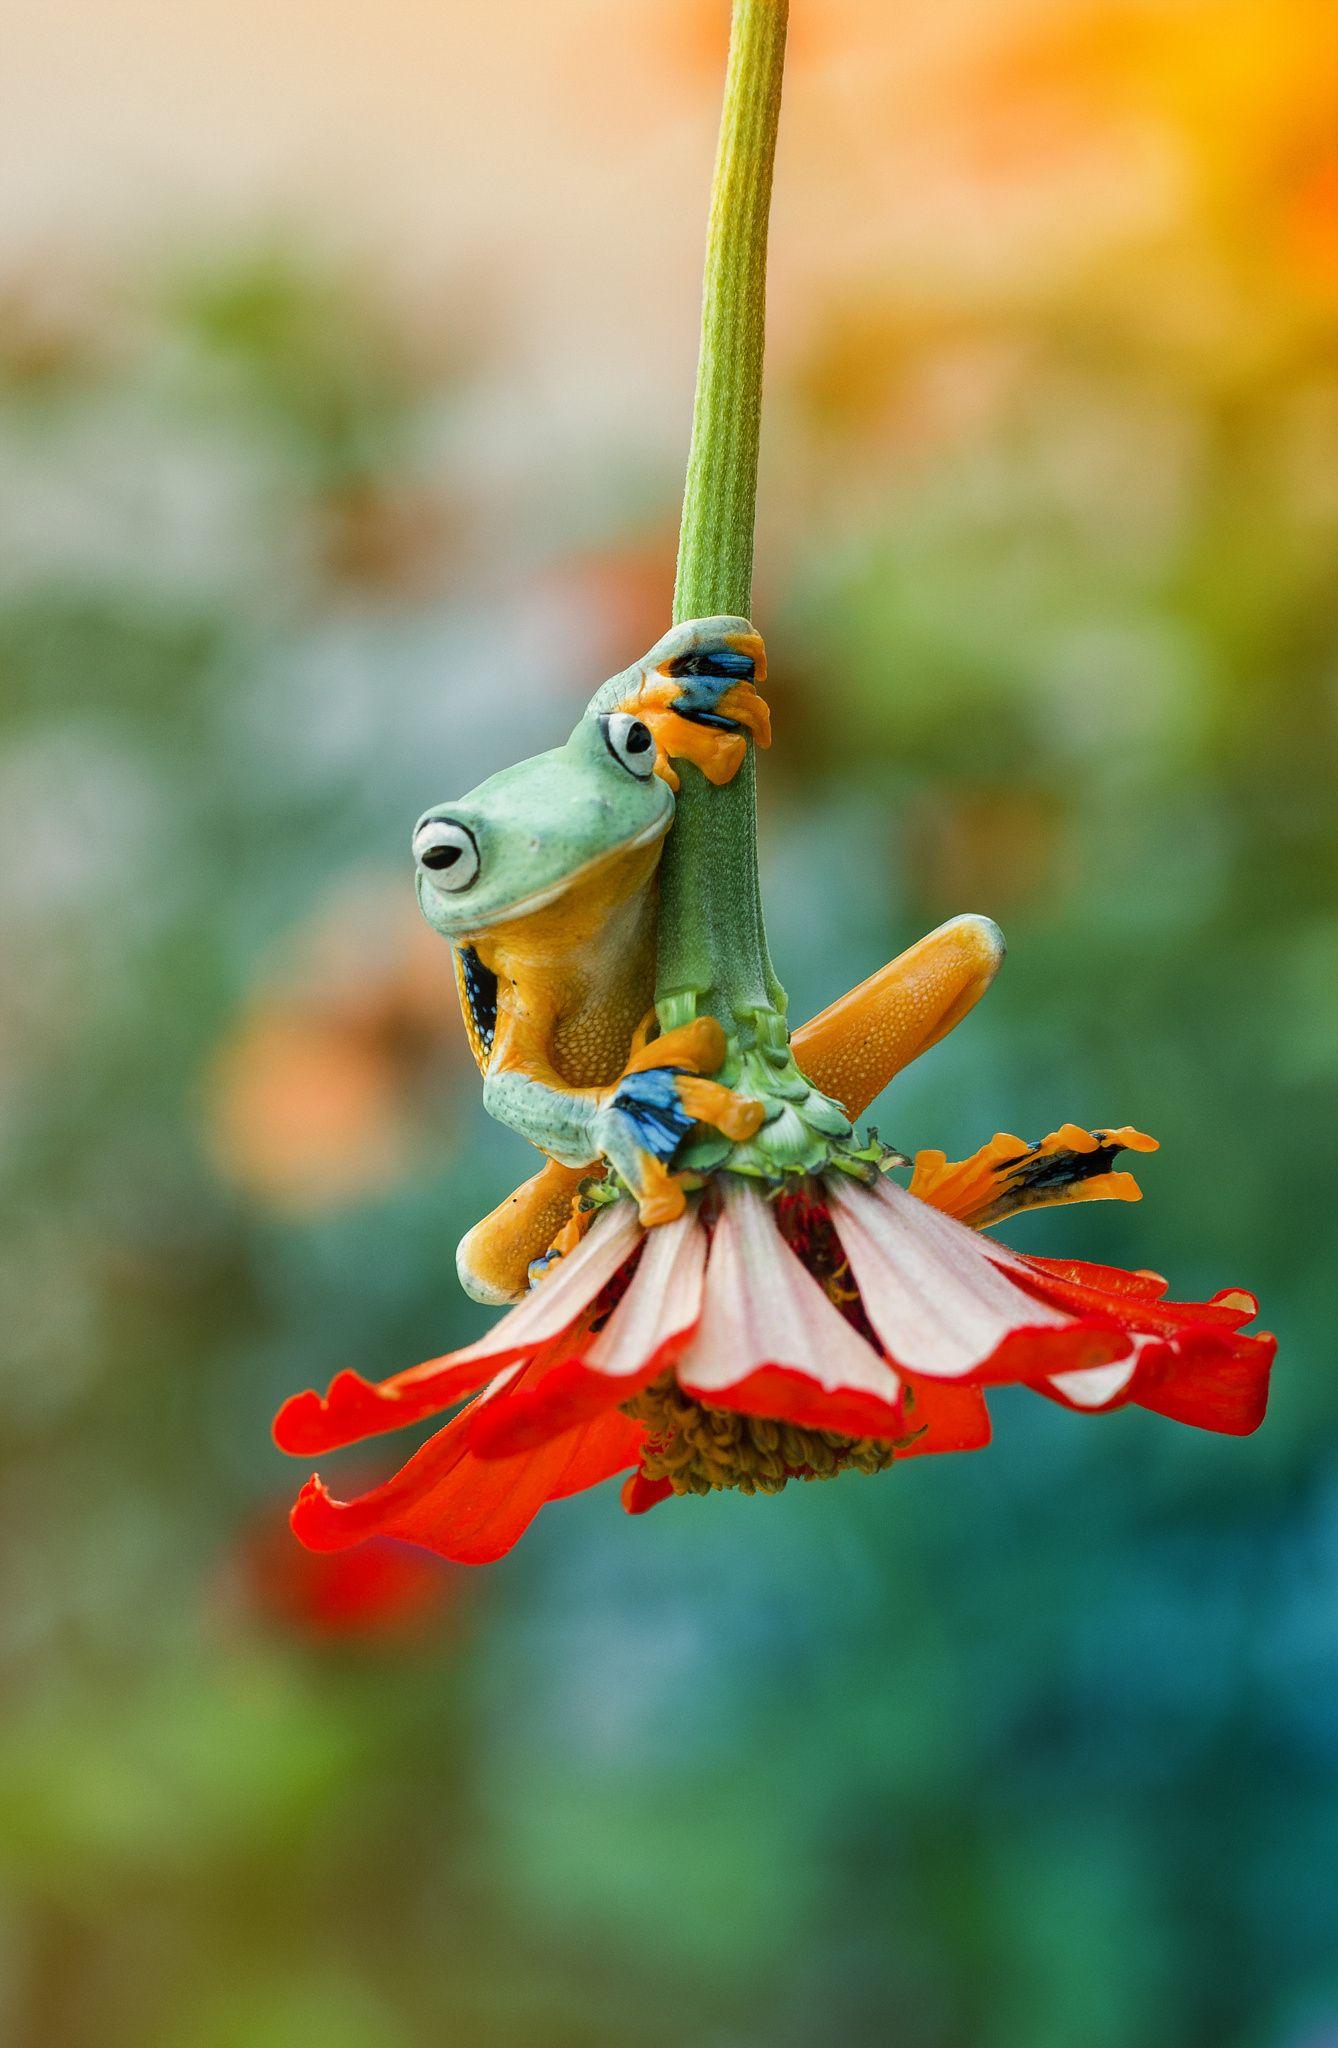 ~~Hello, hello | frog | by Tri Setyo Widodo~~